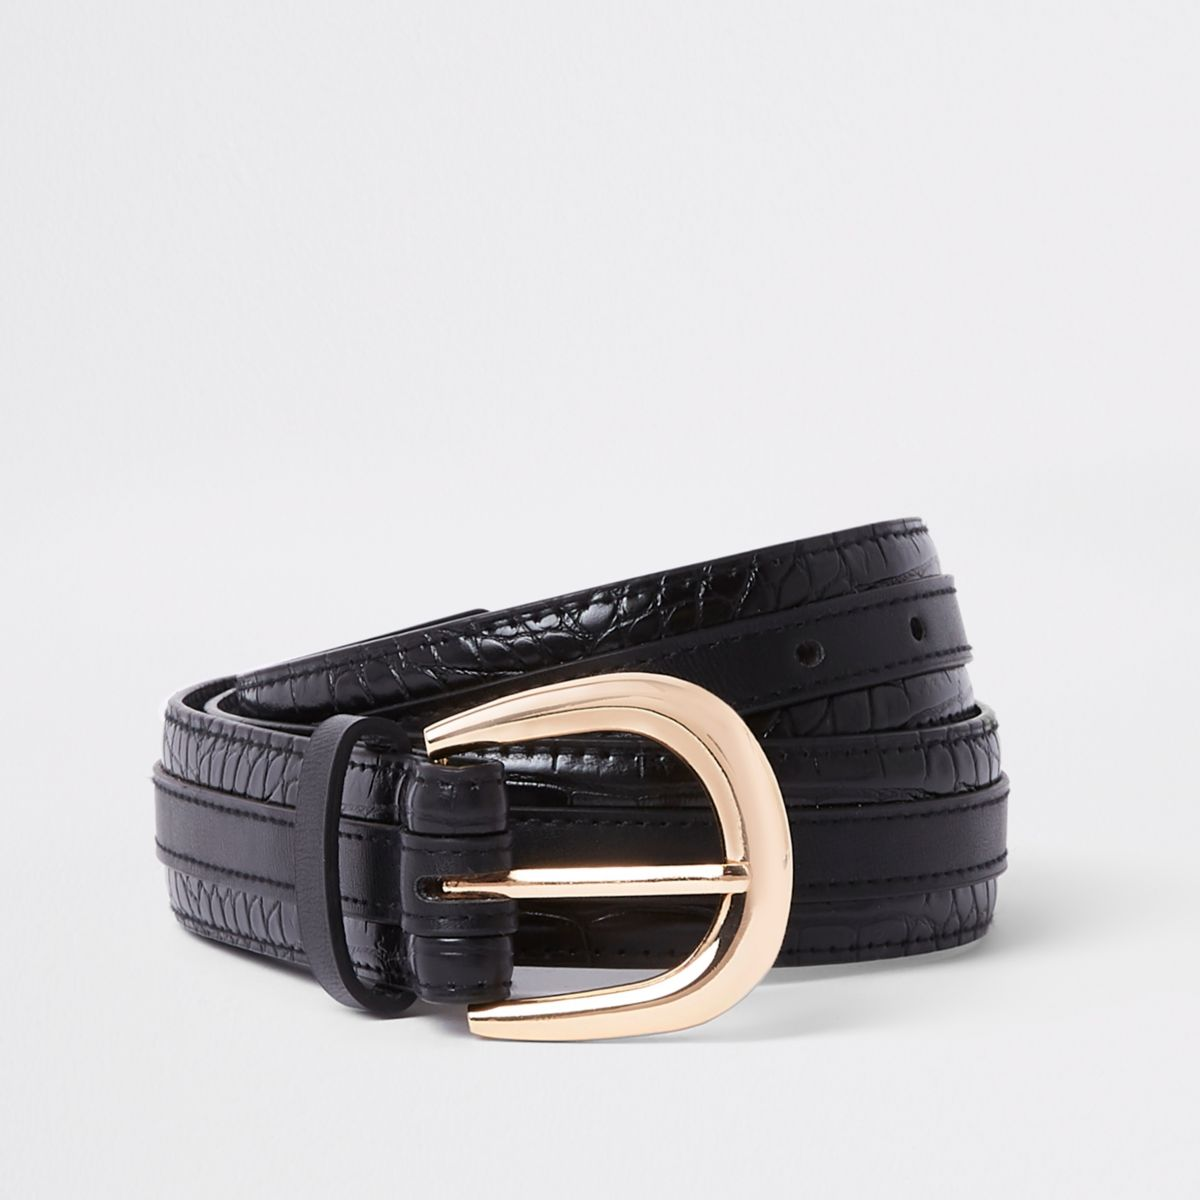 Black croc layered waist and jeans belt